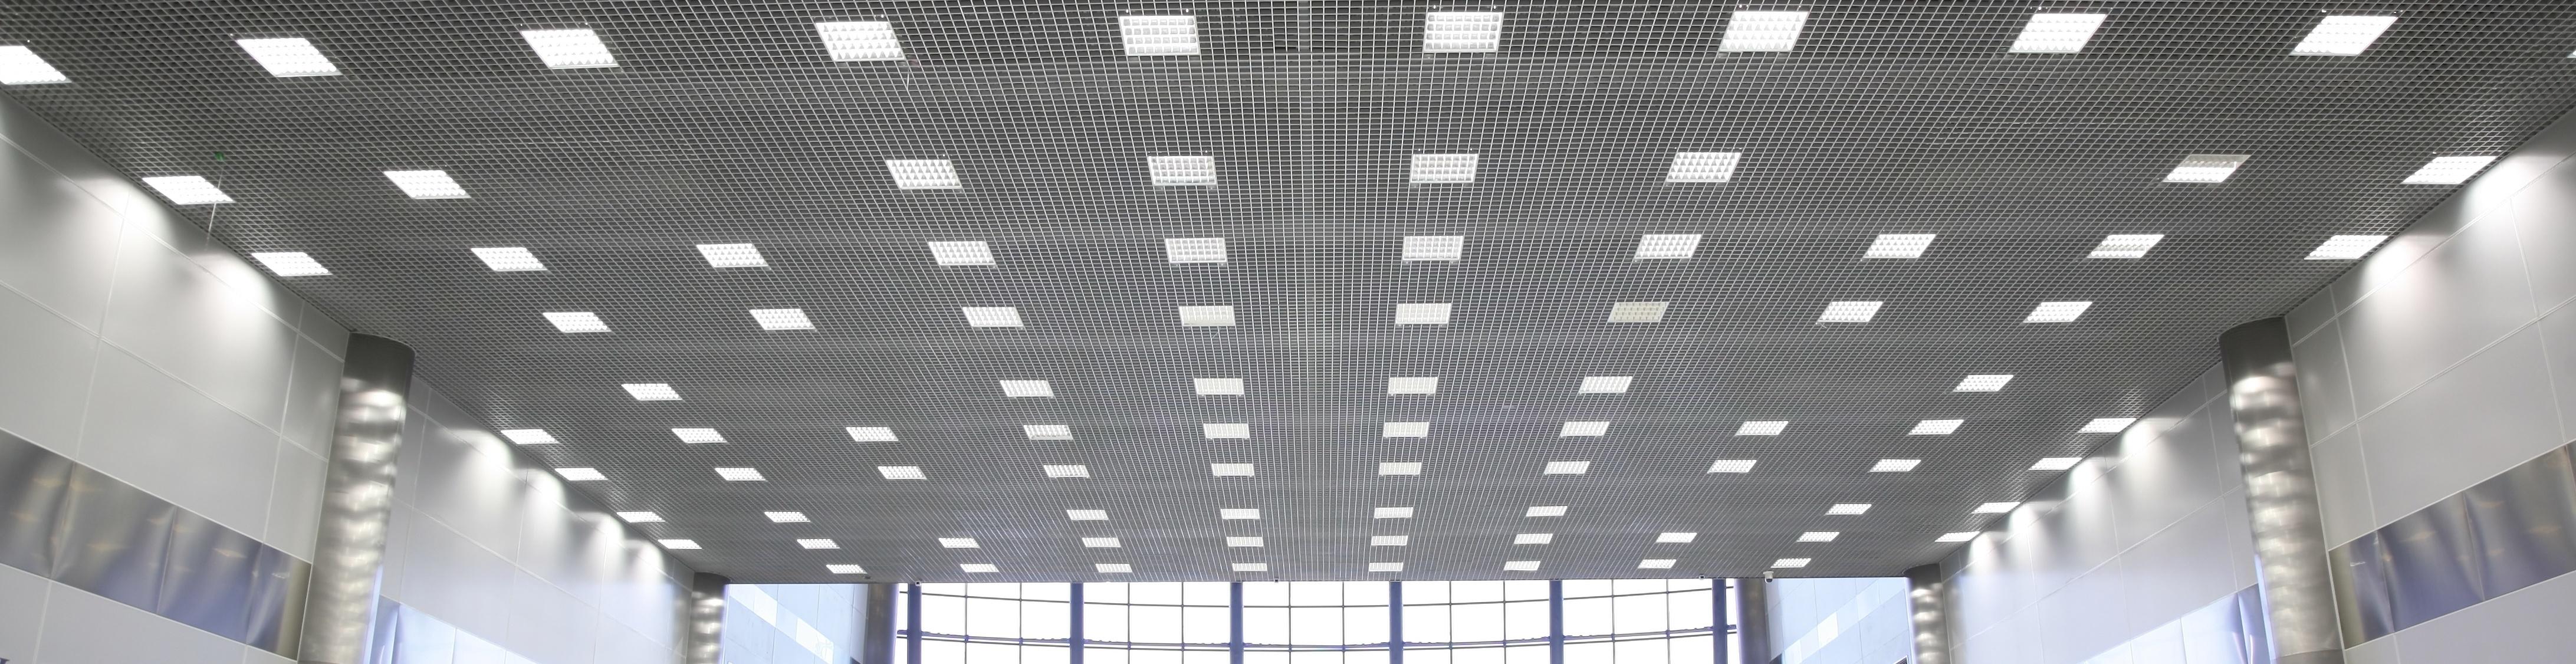 lights_upper_trimmed.jpg